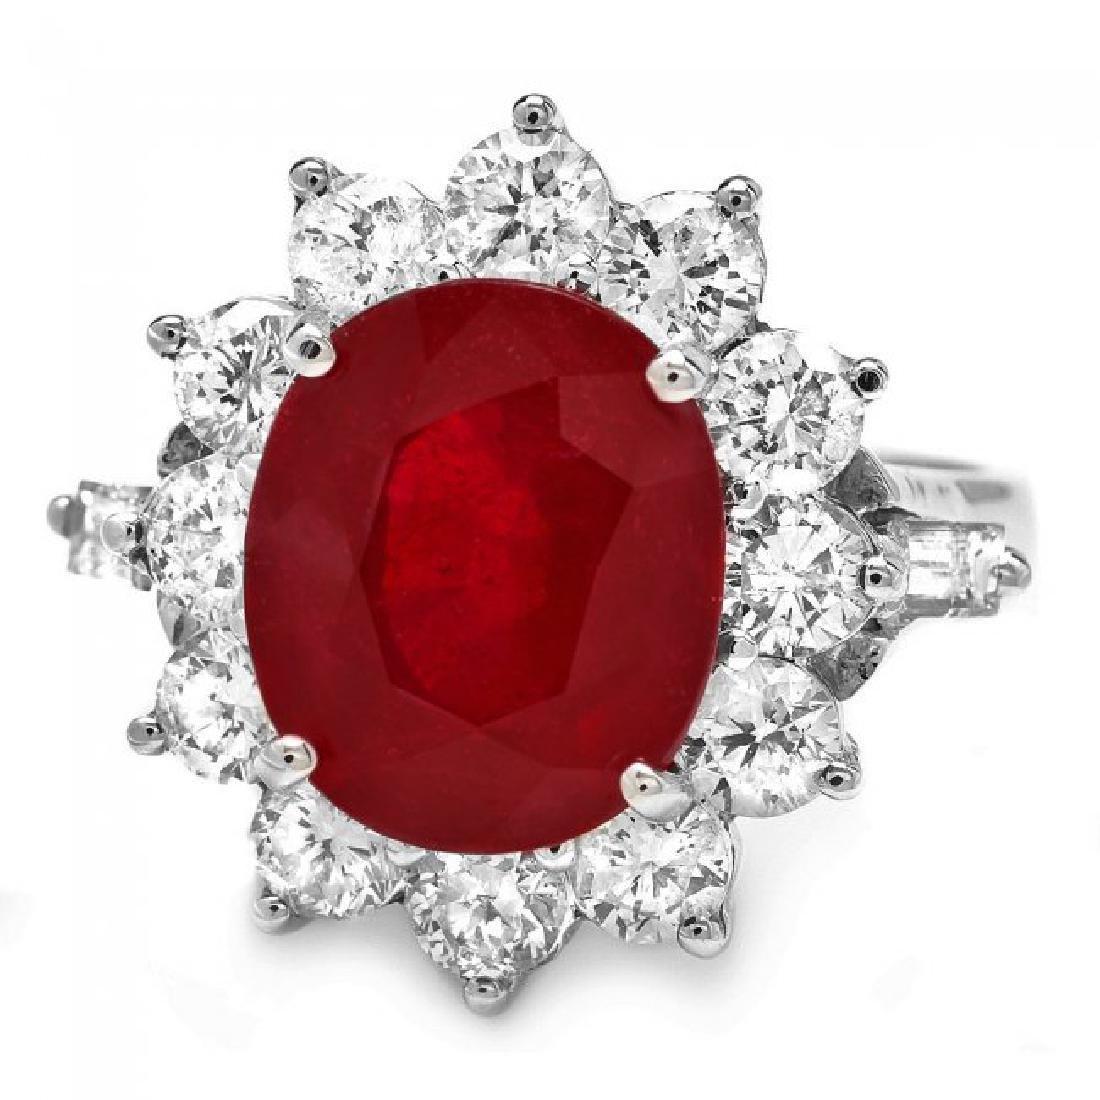 14k White Gold 7.00ct Ruby 2.3ct Diamond Ring - 2